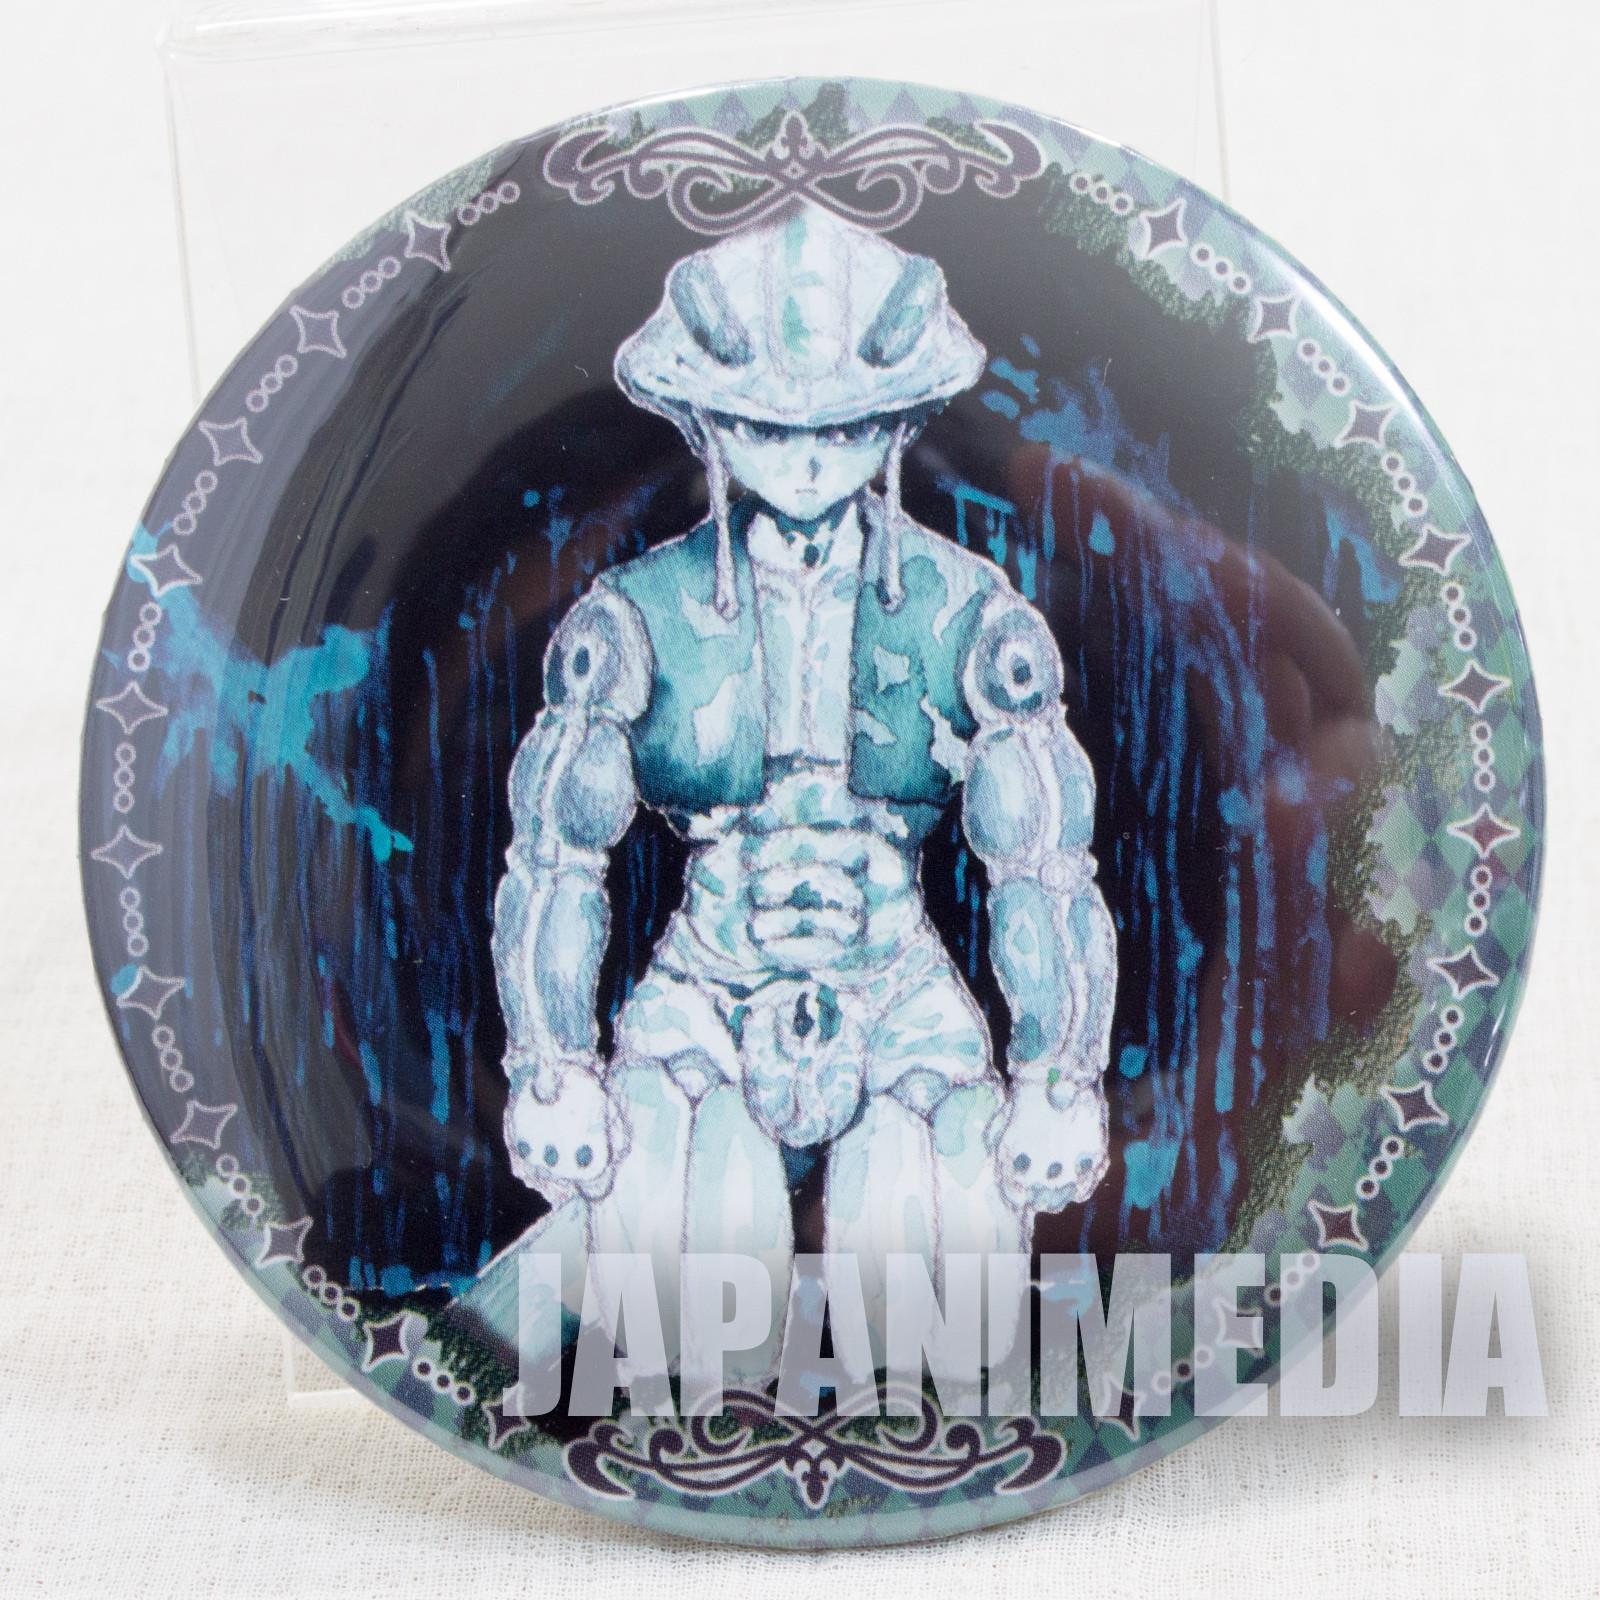 HUNTER x HUNTER Meruem Collection Button Badge JAPAN ANIME